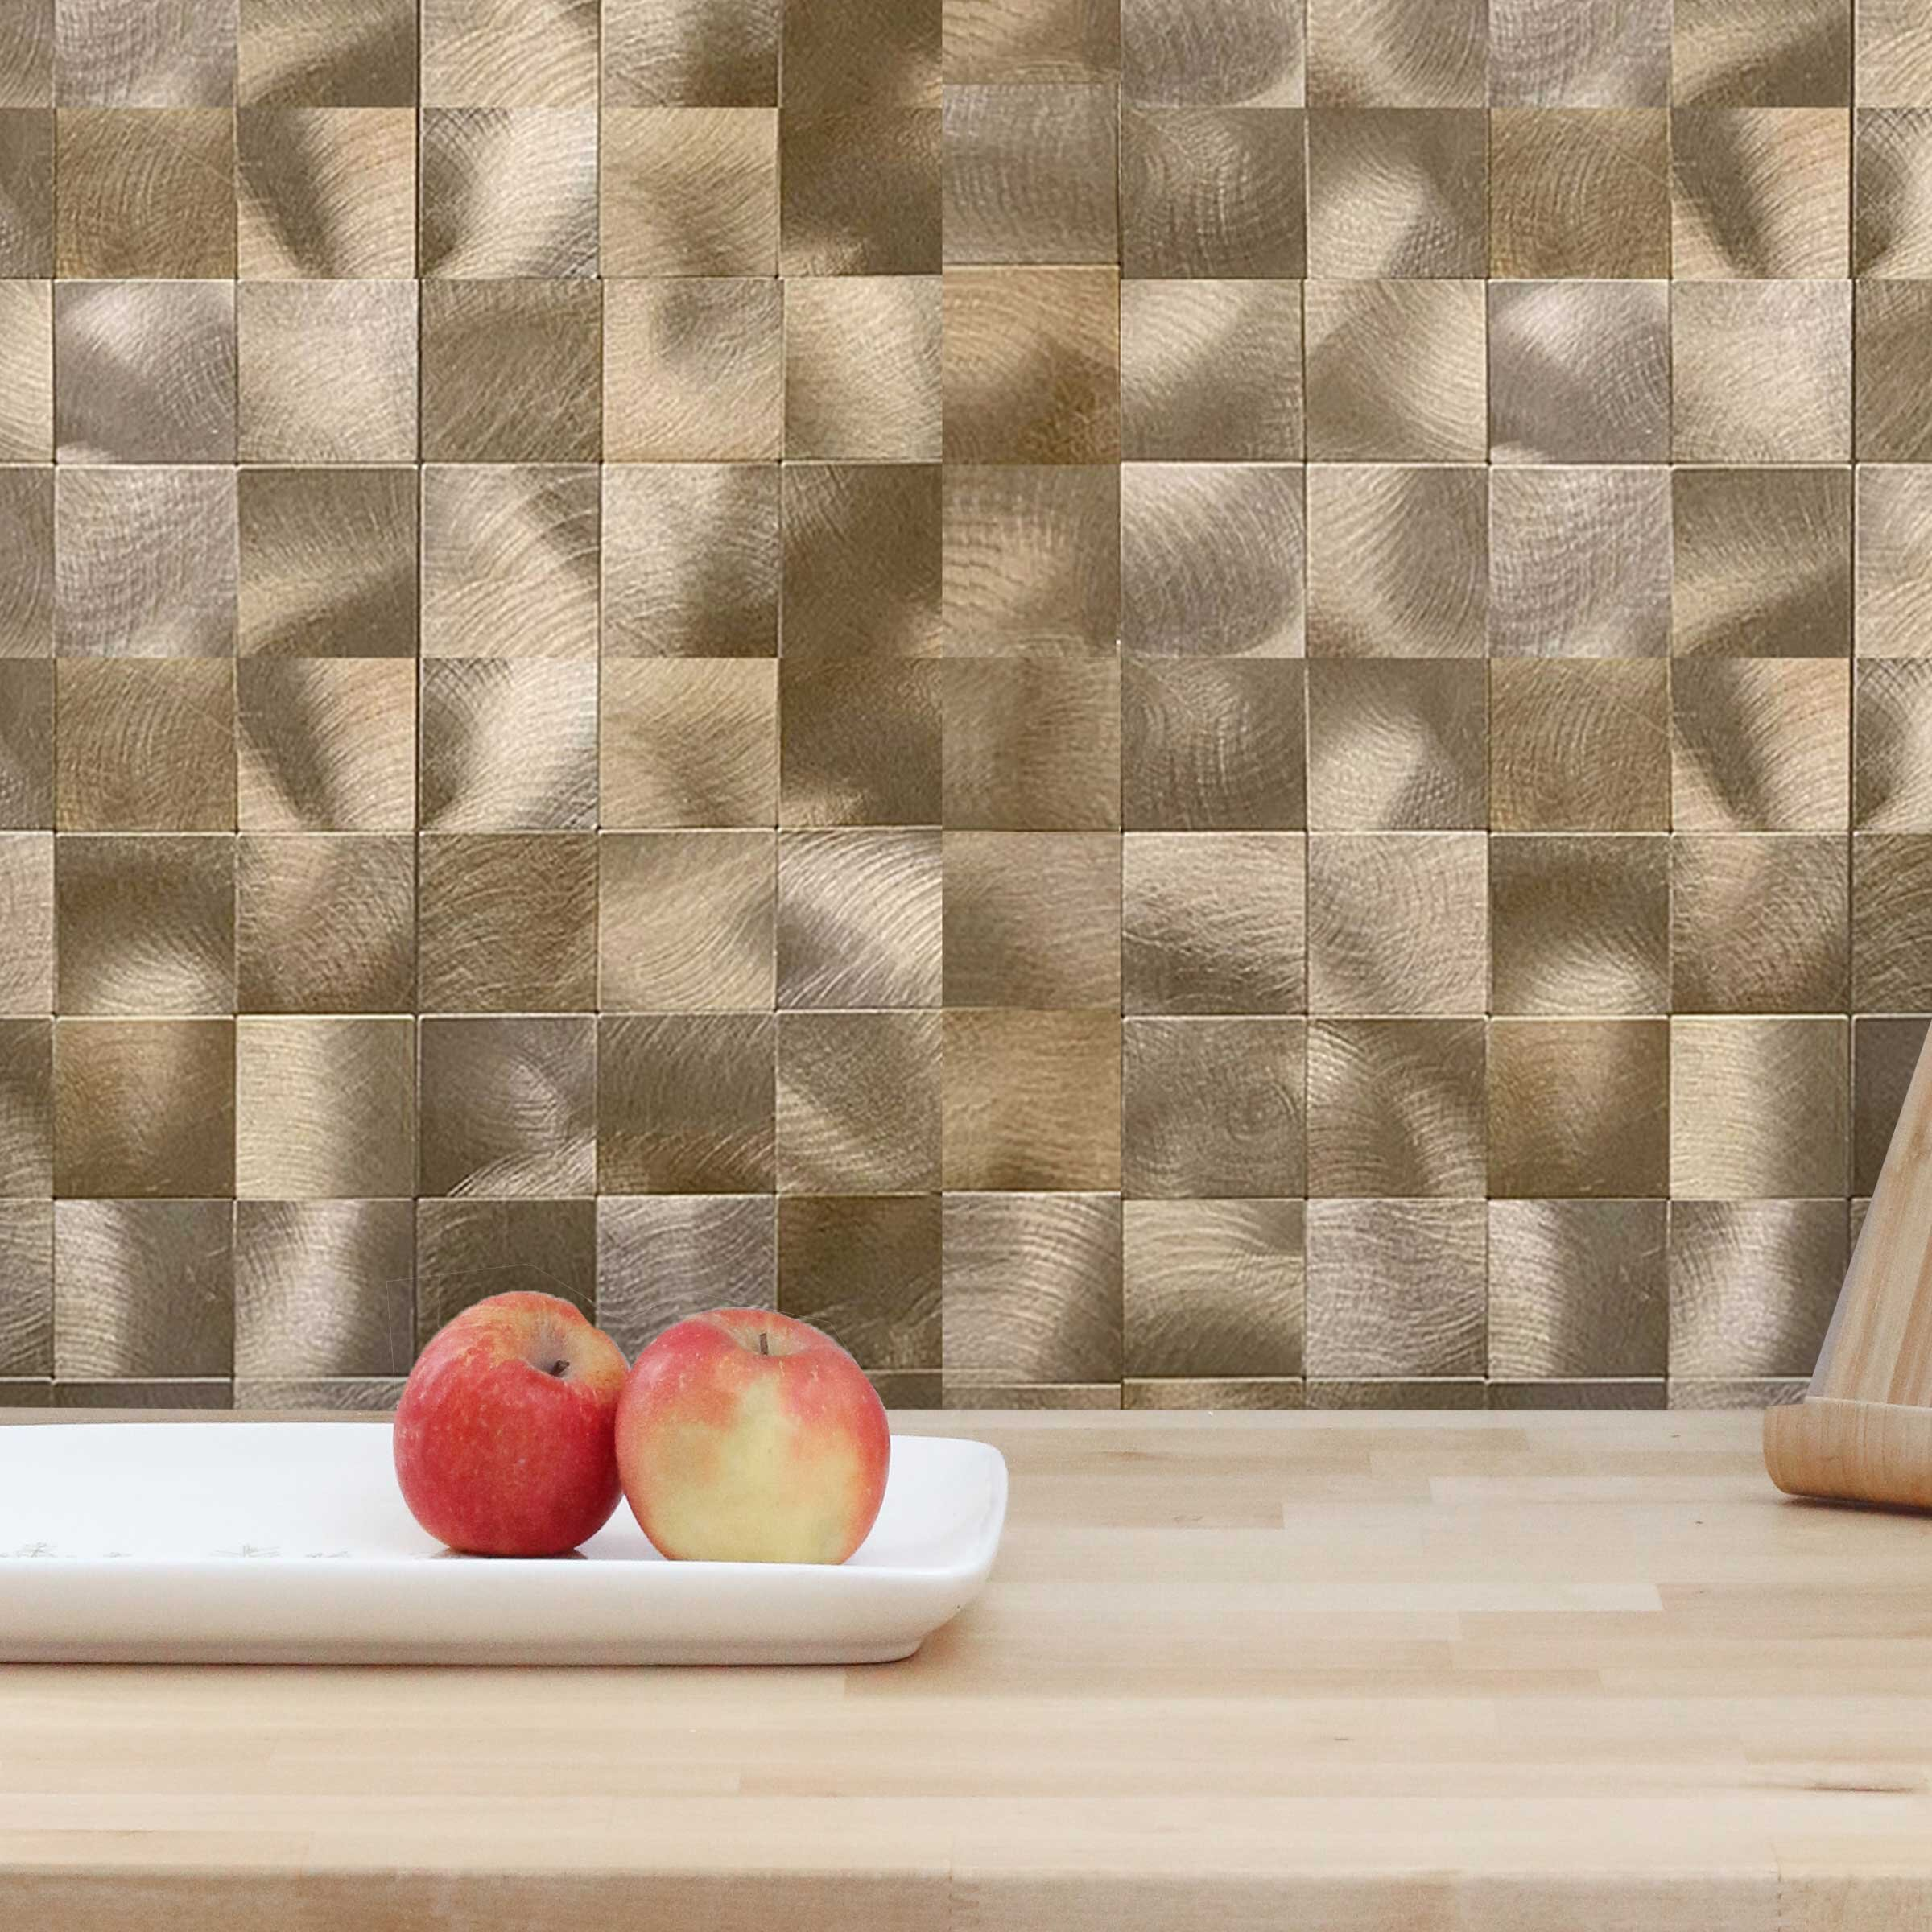 Design Is Personal 12 X 12 Pvc Peel Stick Mosaic Tile In Copper Gold Reviews Wayfair